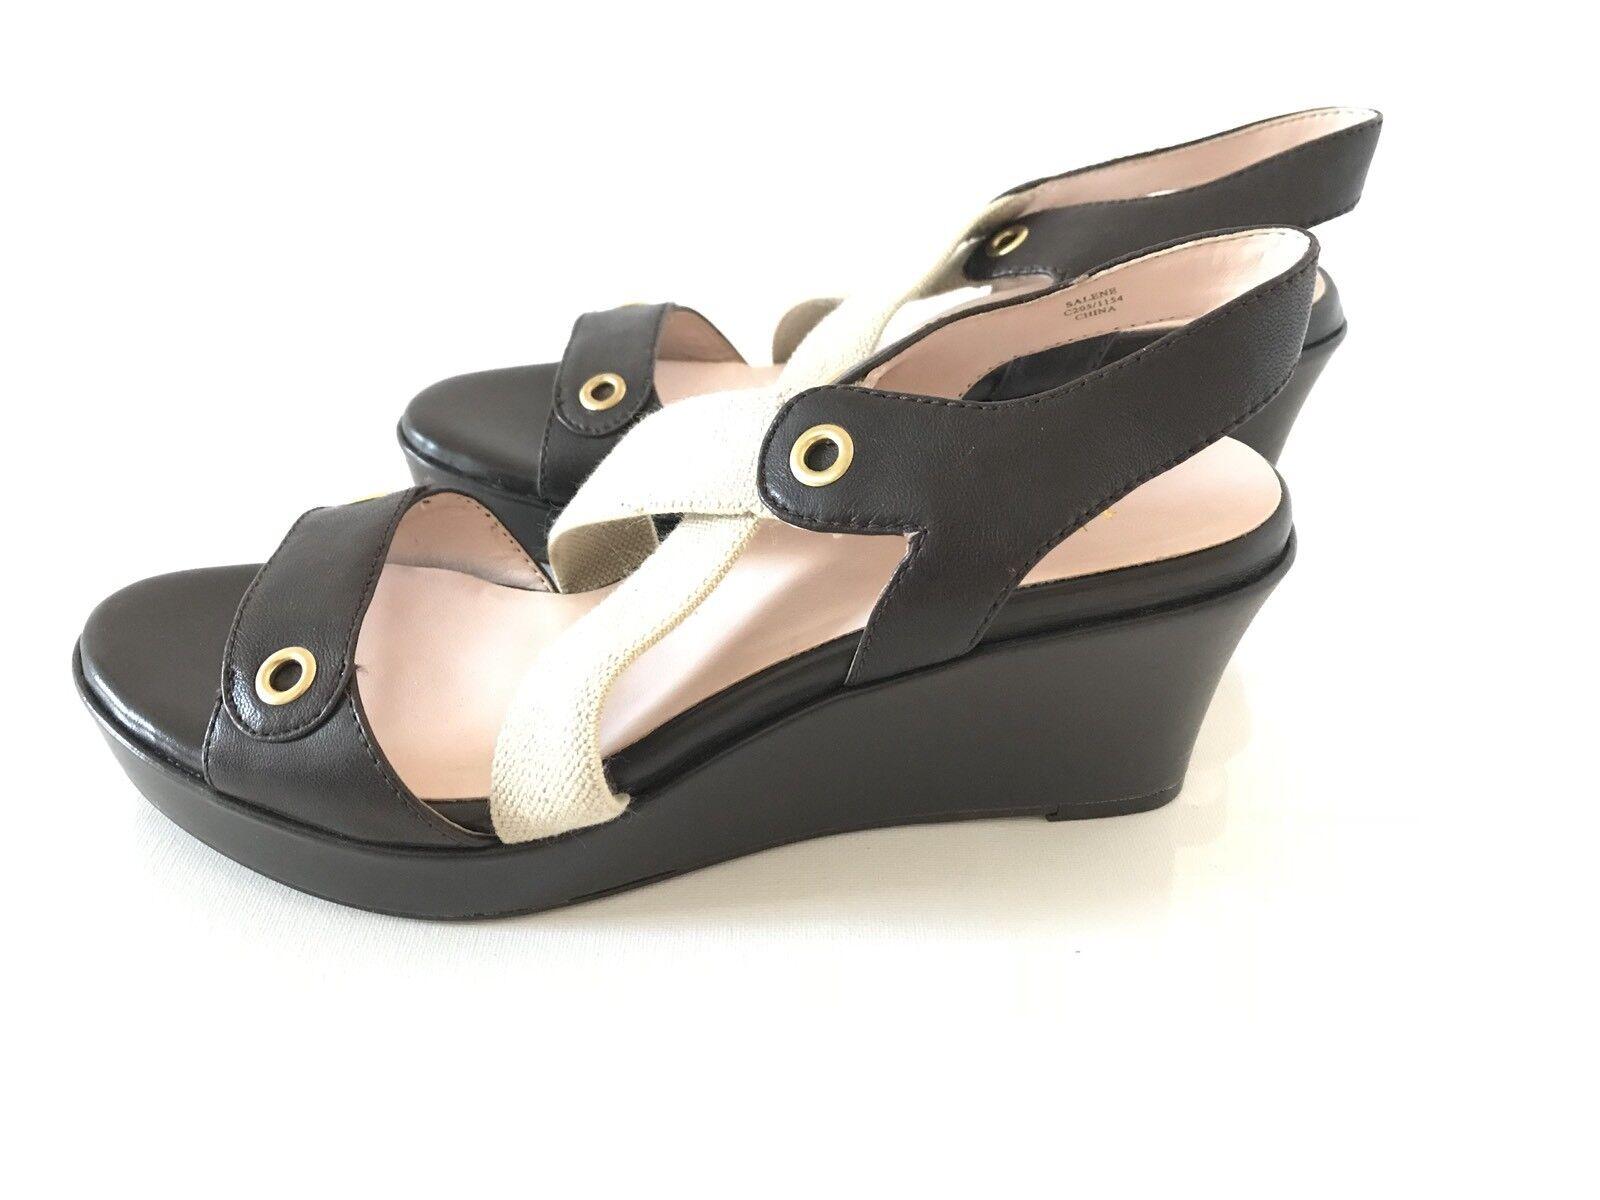 Taryn rosa donna scarpe Dimensione 7.5 Salene Salene Salene Platform Wedge Sandal Open Toe Marronee ed23a3